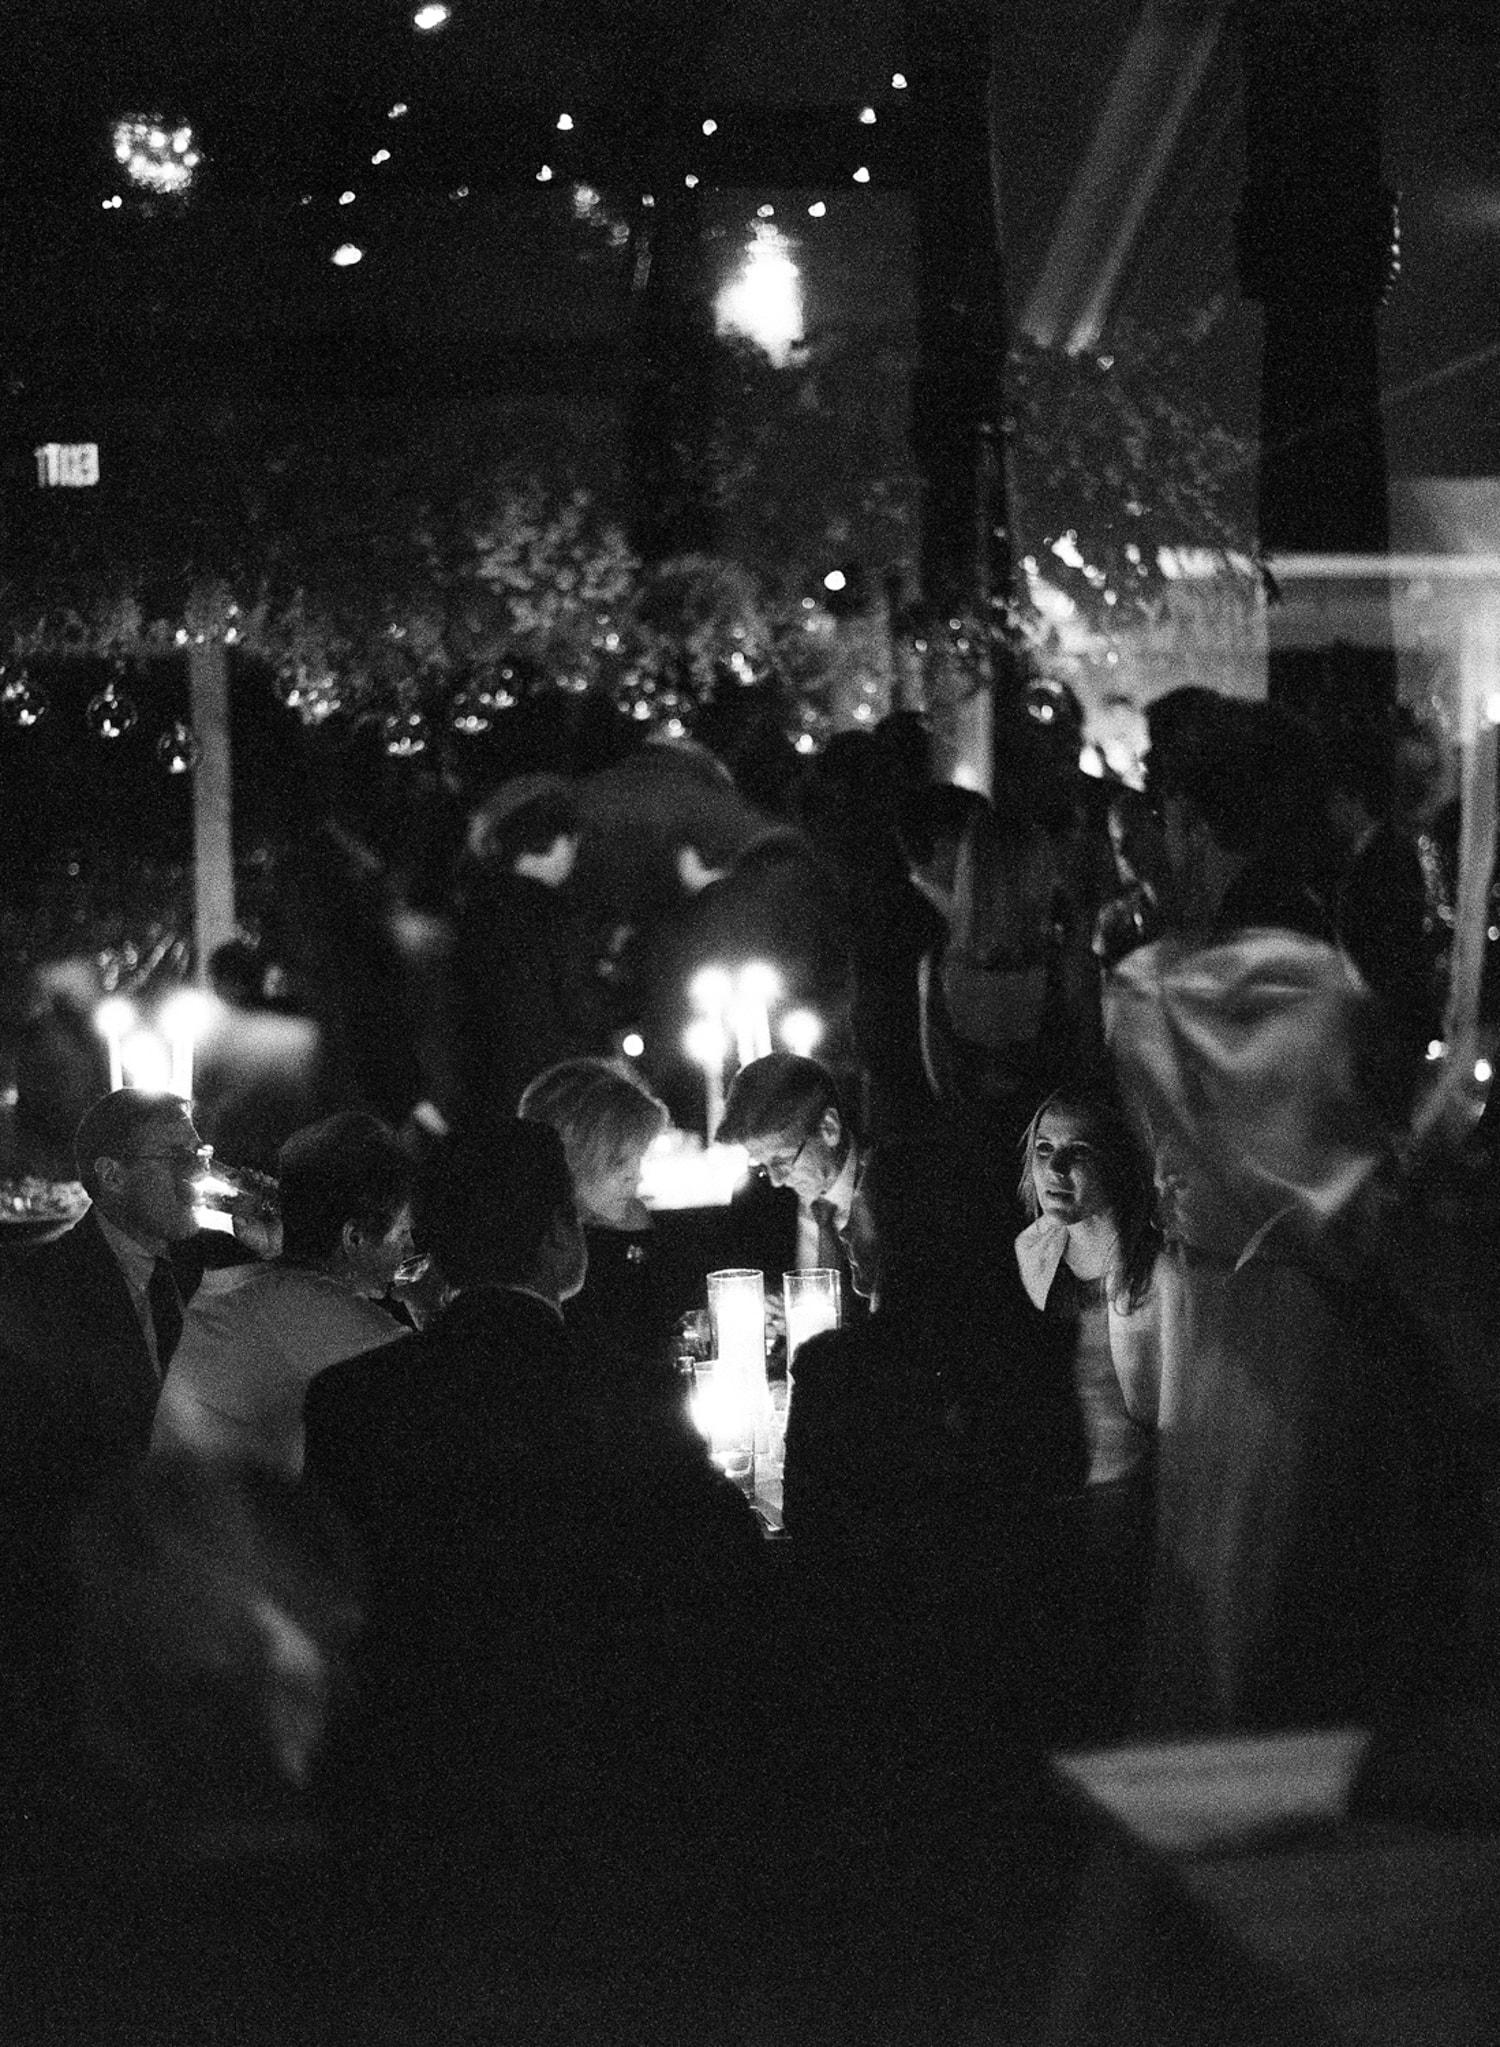 barr-mansion-wedding-74.jpg